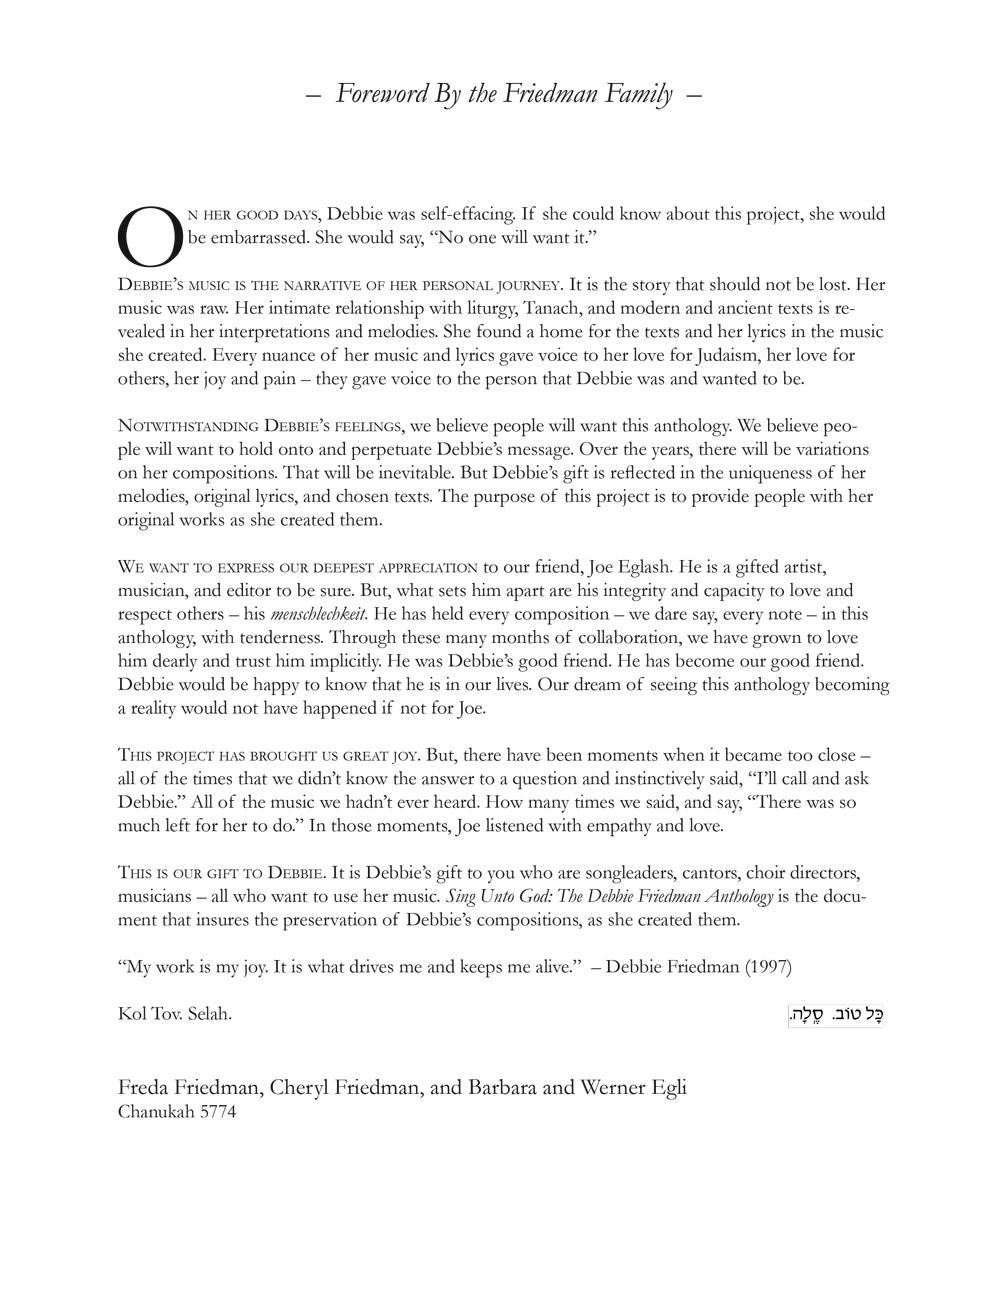 Sing-Unto-God-guts-Forewords1.jpg